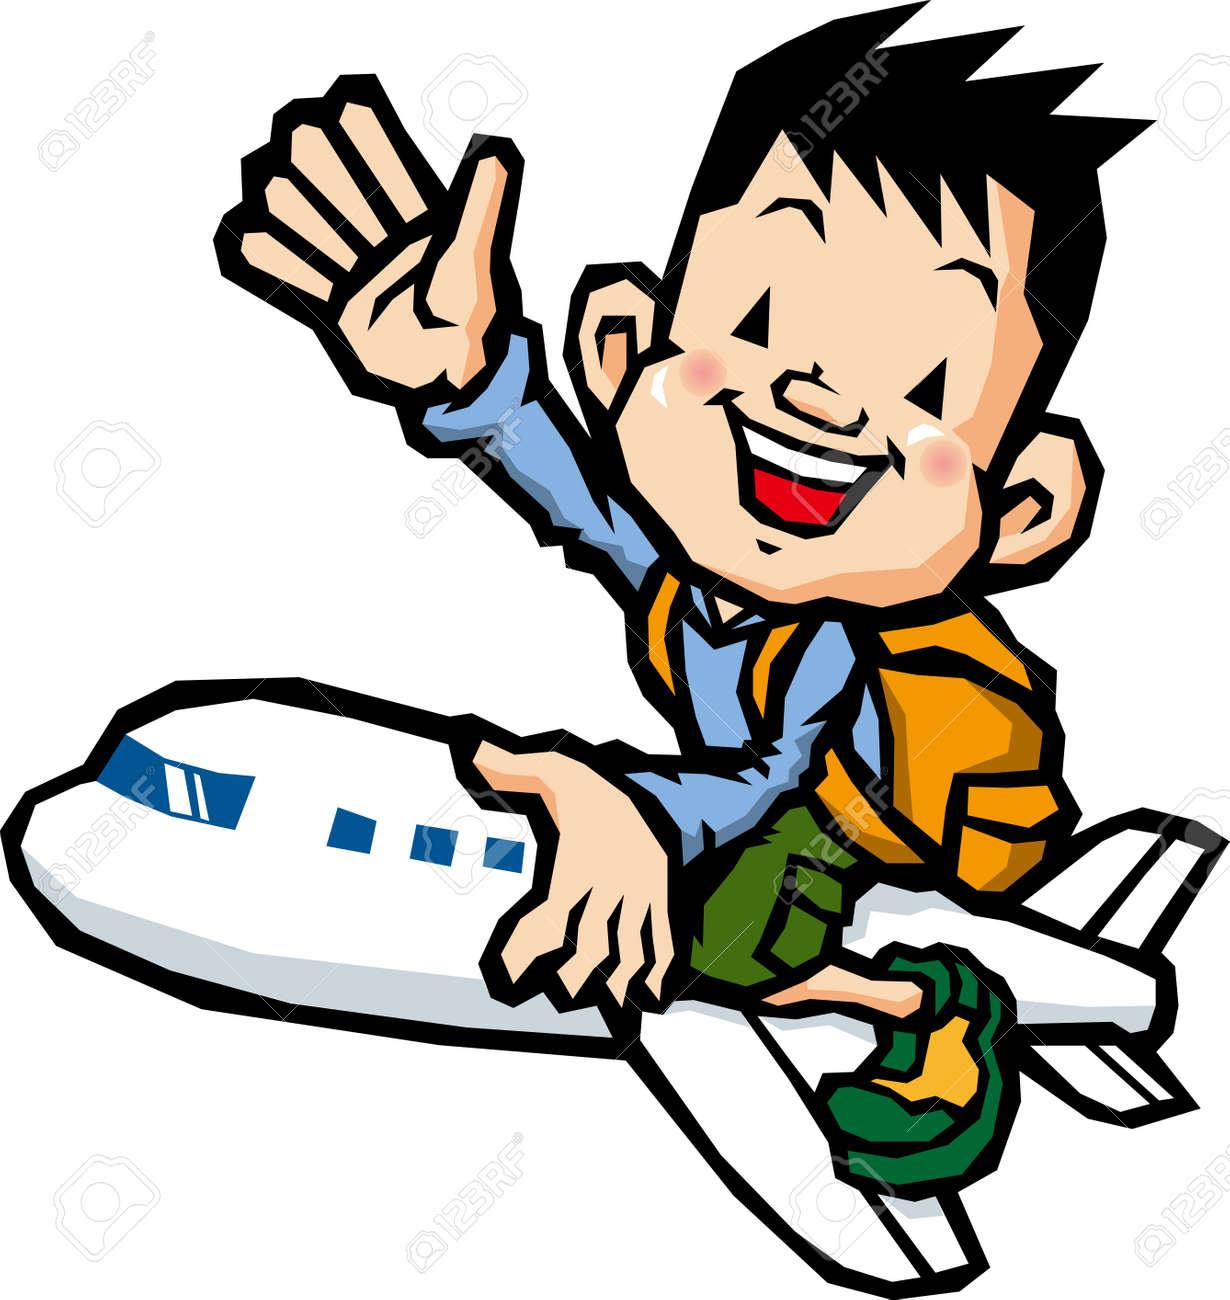 Boy Riding On An Airplane